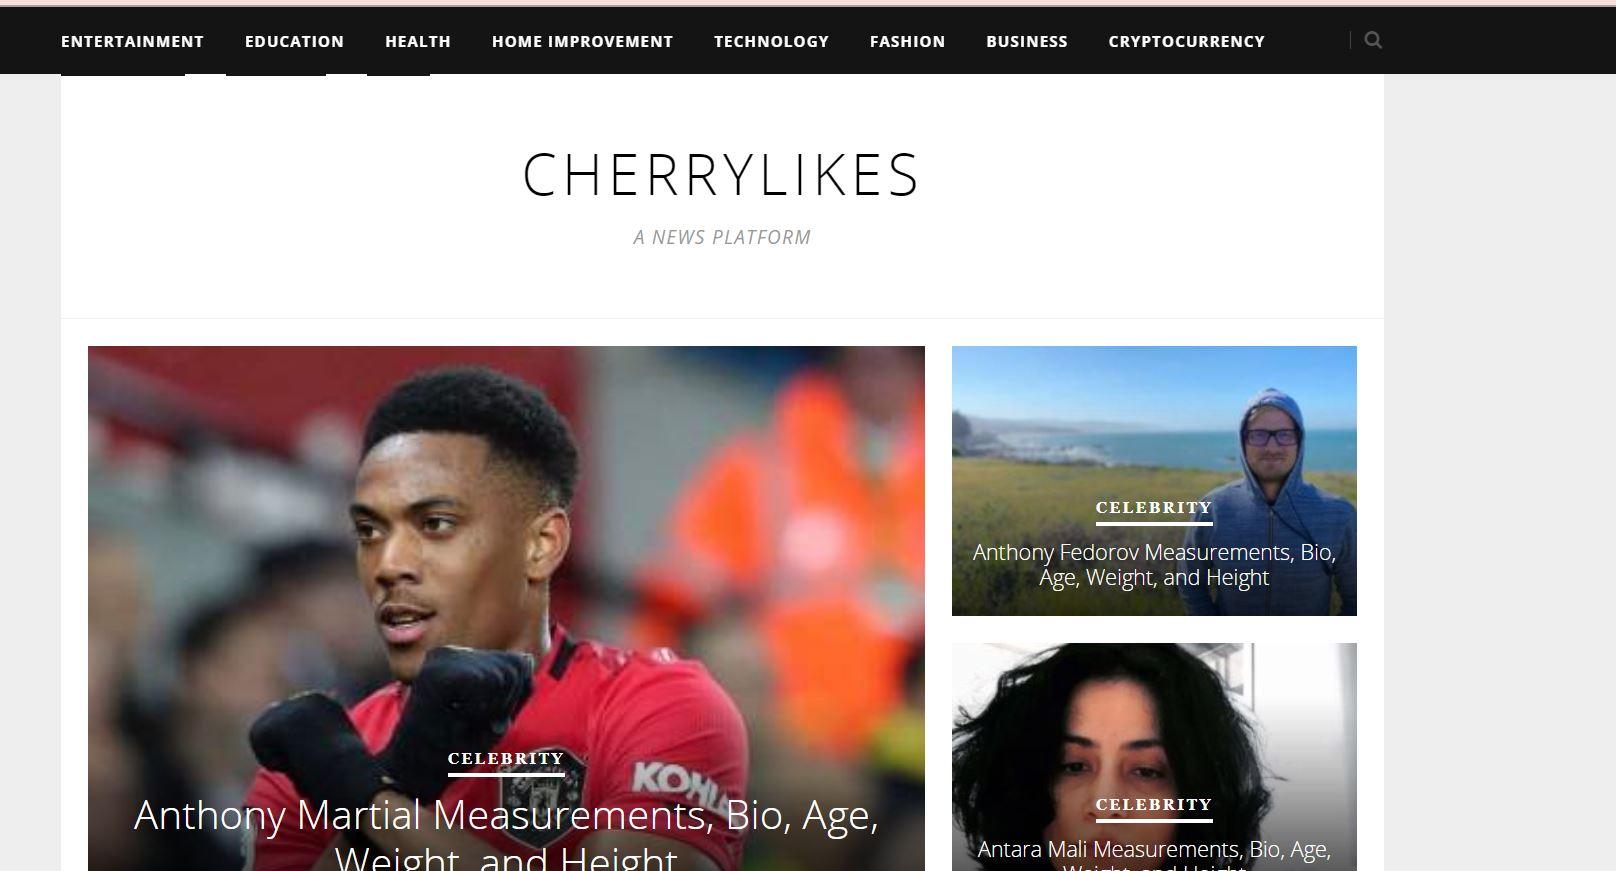 Cherryclicks